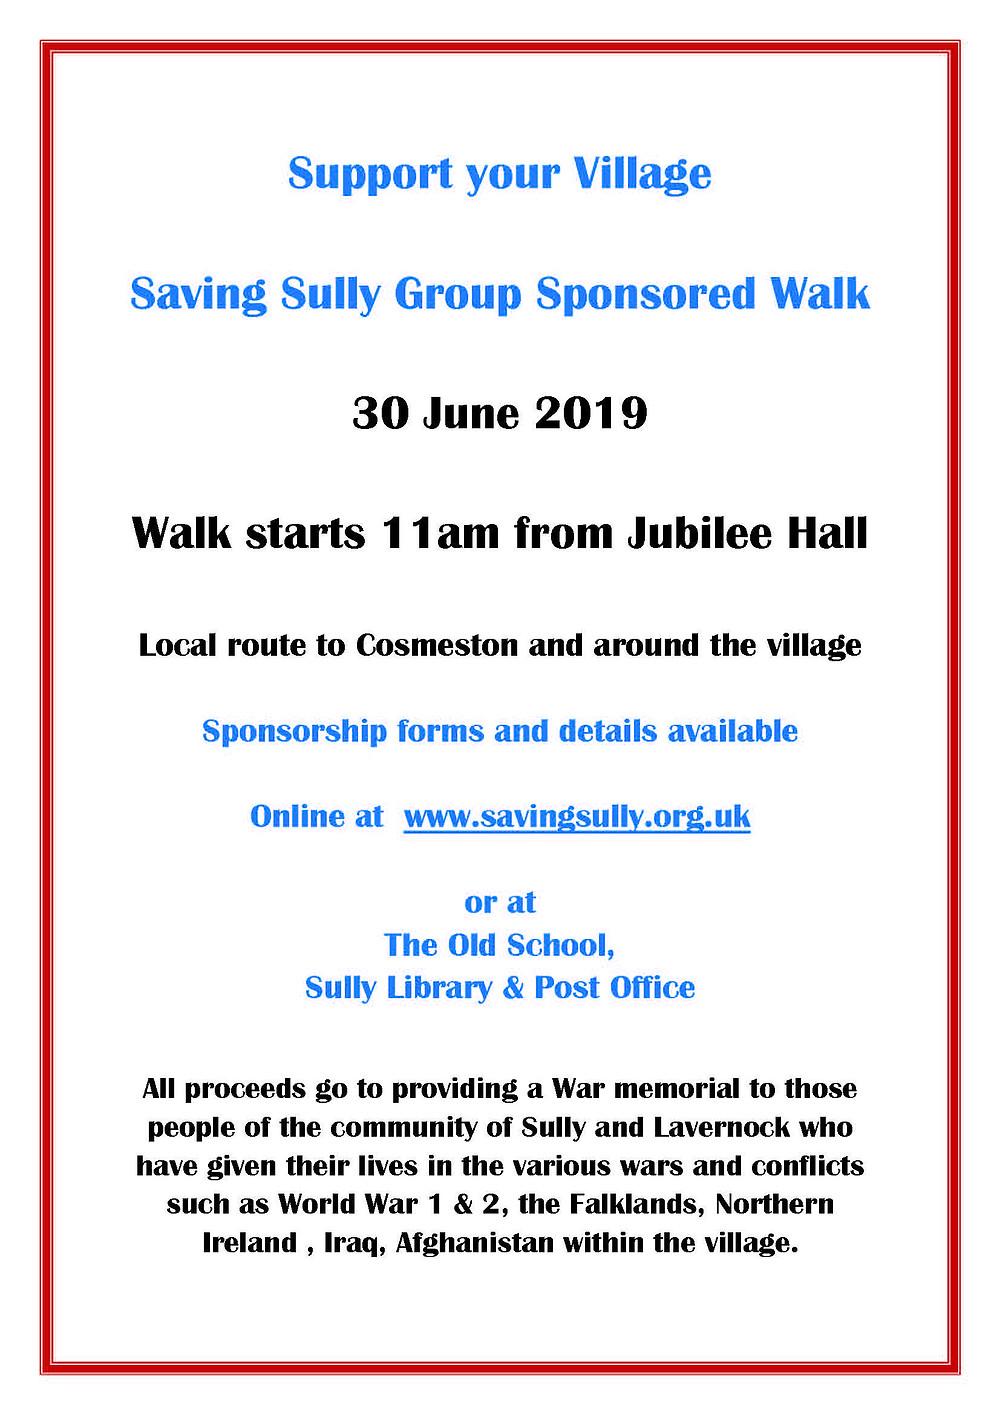 Poster Sponsored Walk